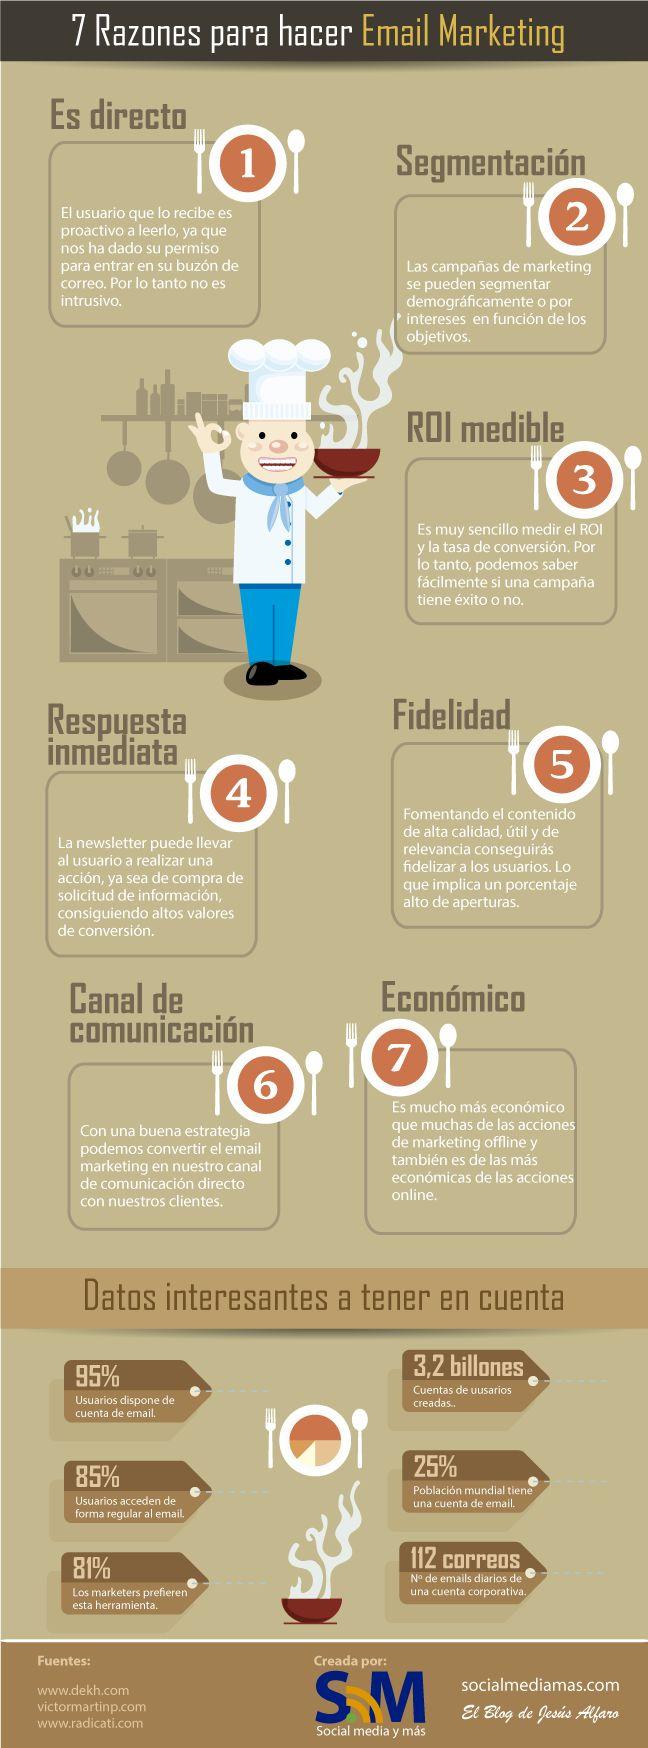 7 razones para hacer email marketing #infografia